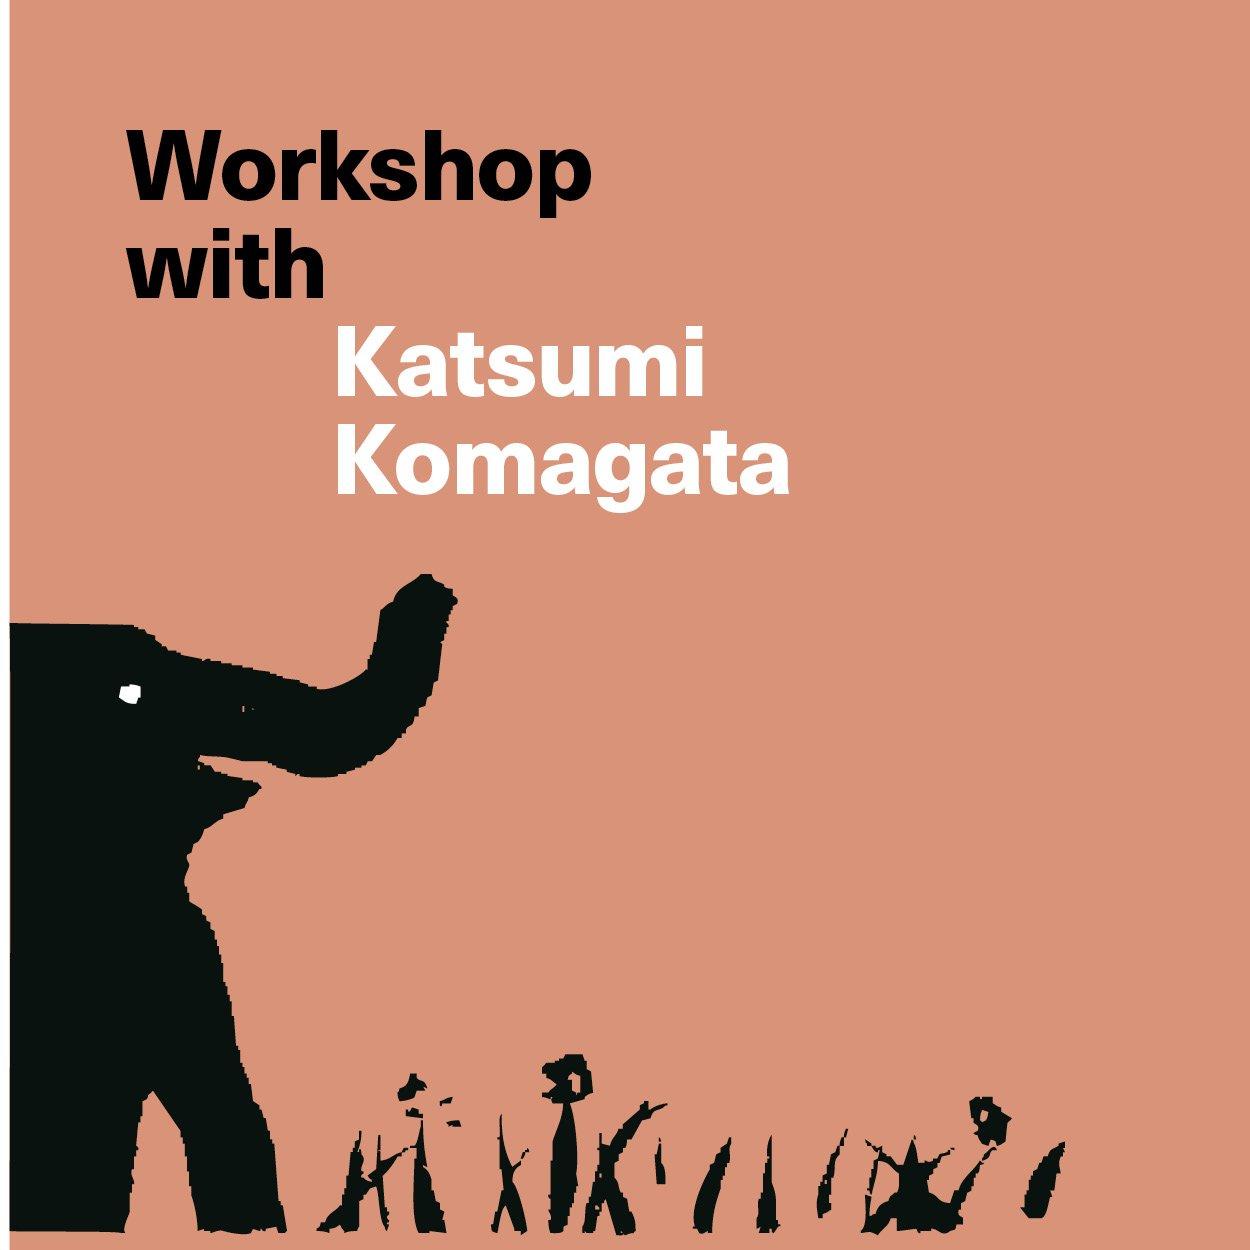 workshop with Katsumi Komagata